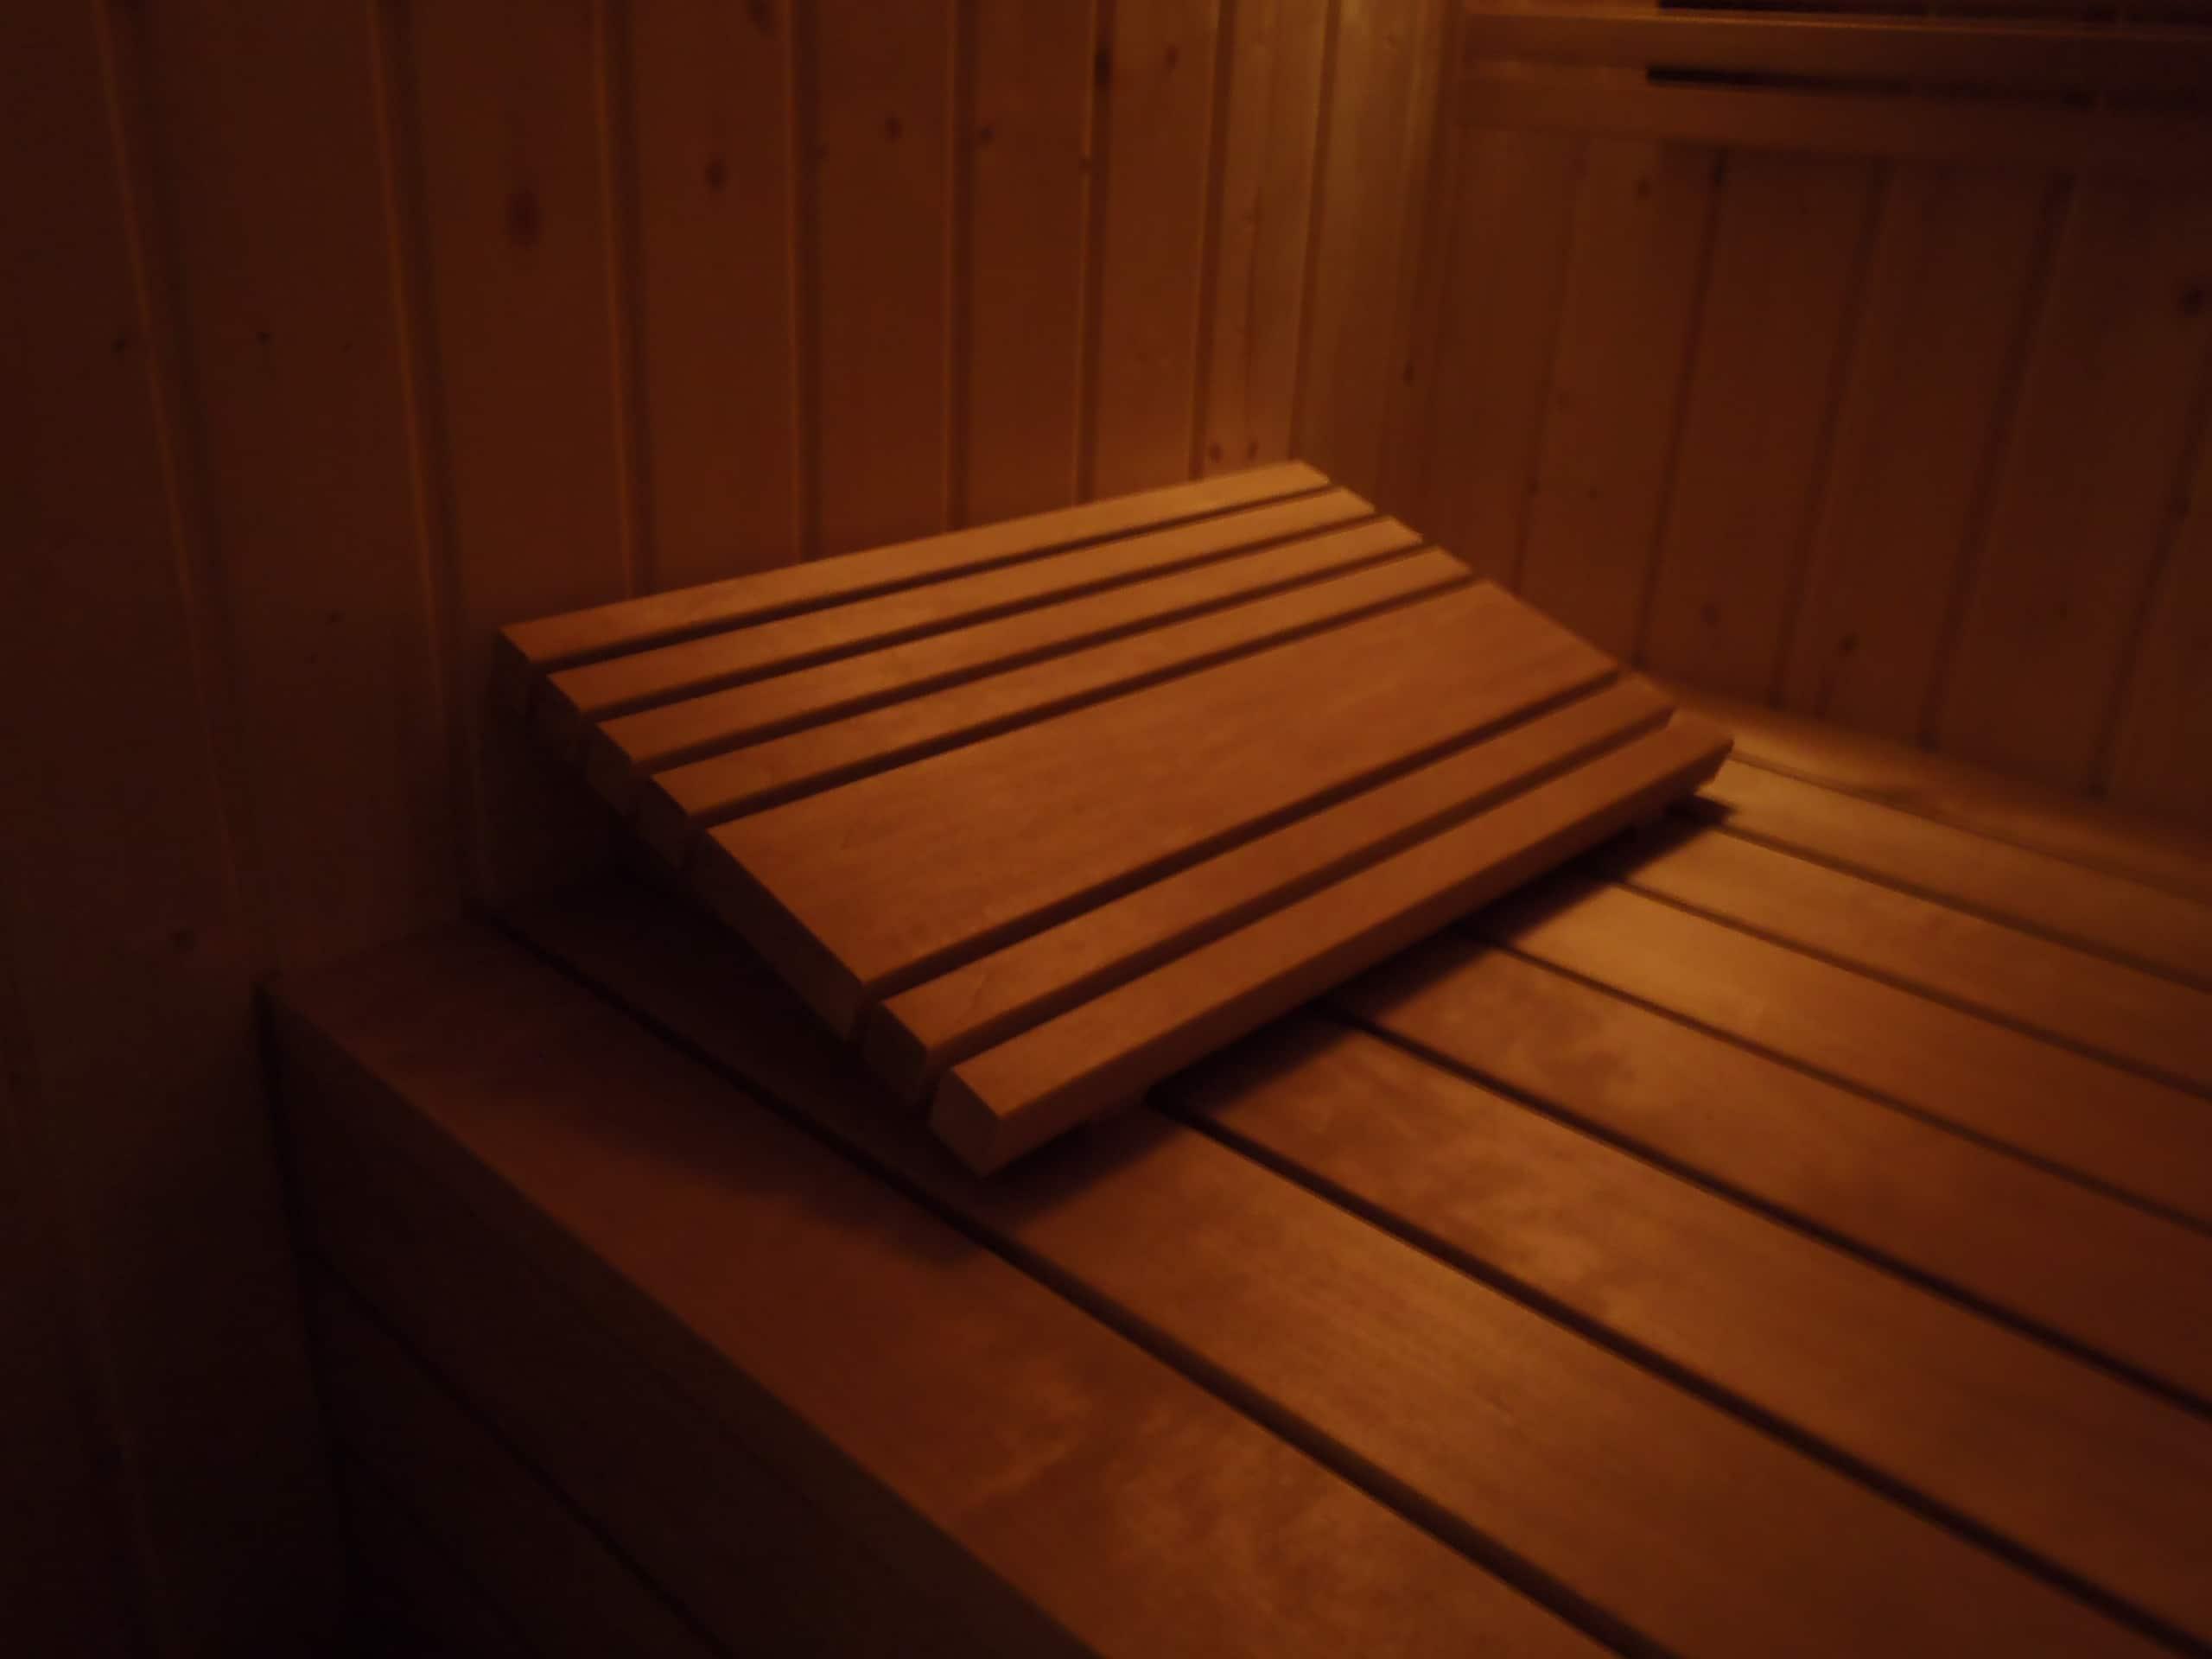 sauna-sucha-budowa-piec-deski-ławka-harvia-drzwi